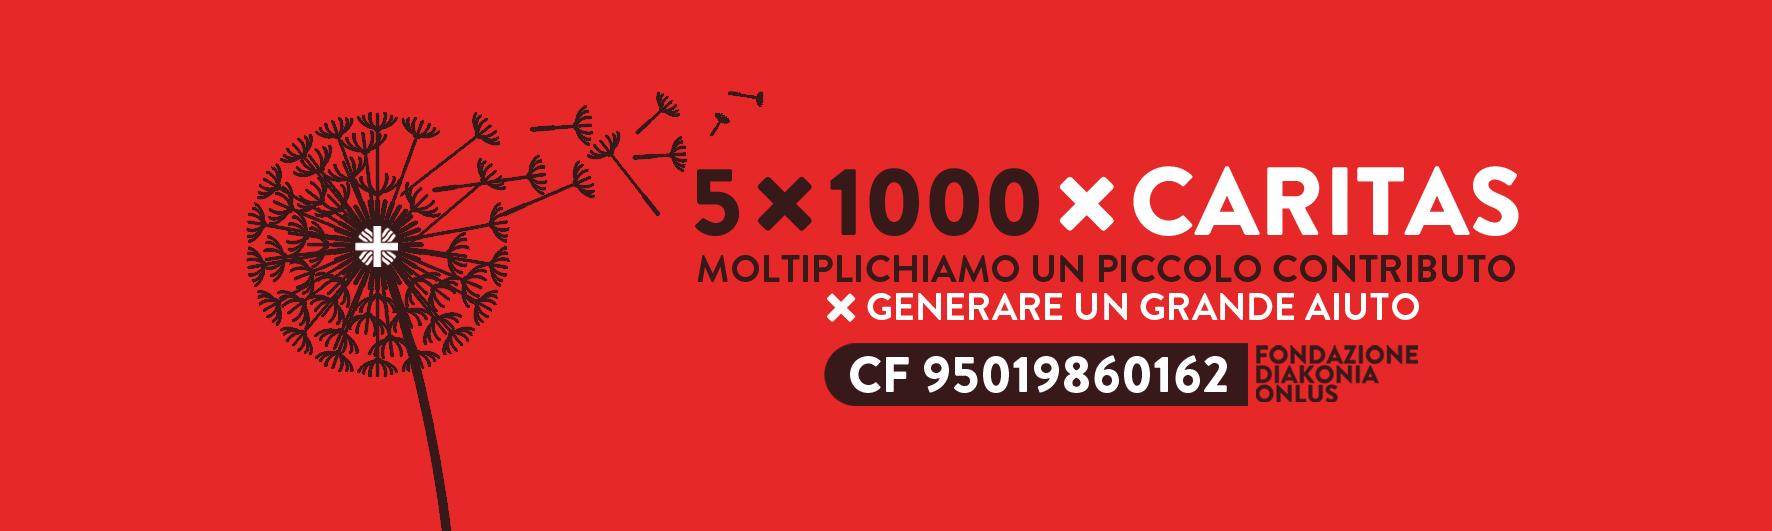 5x1000xCARITAS